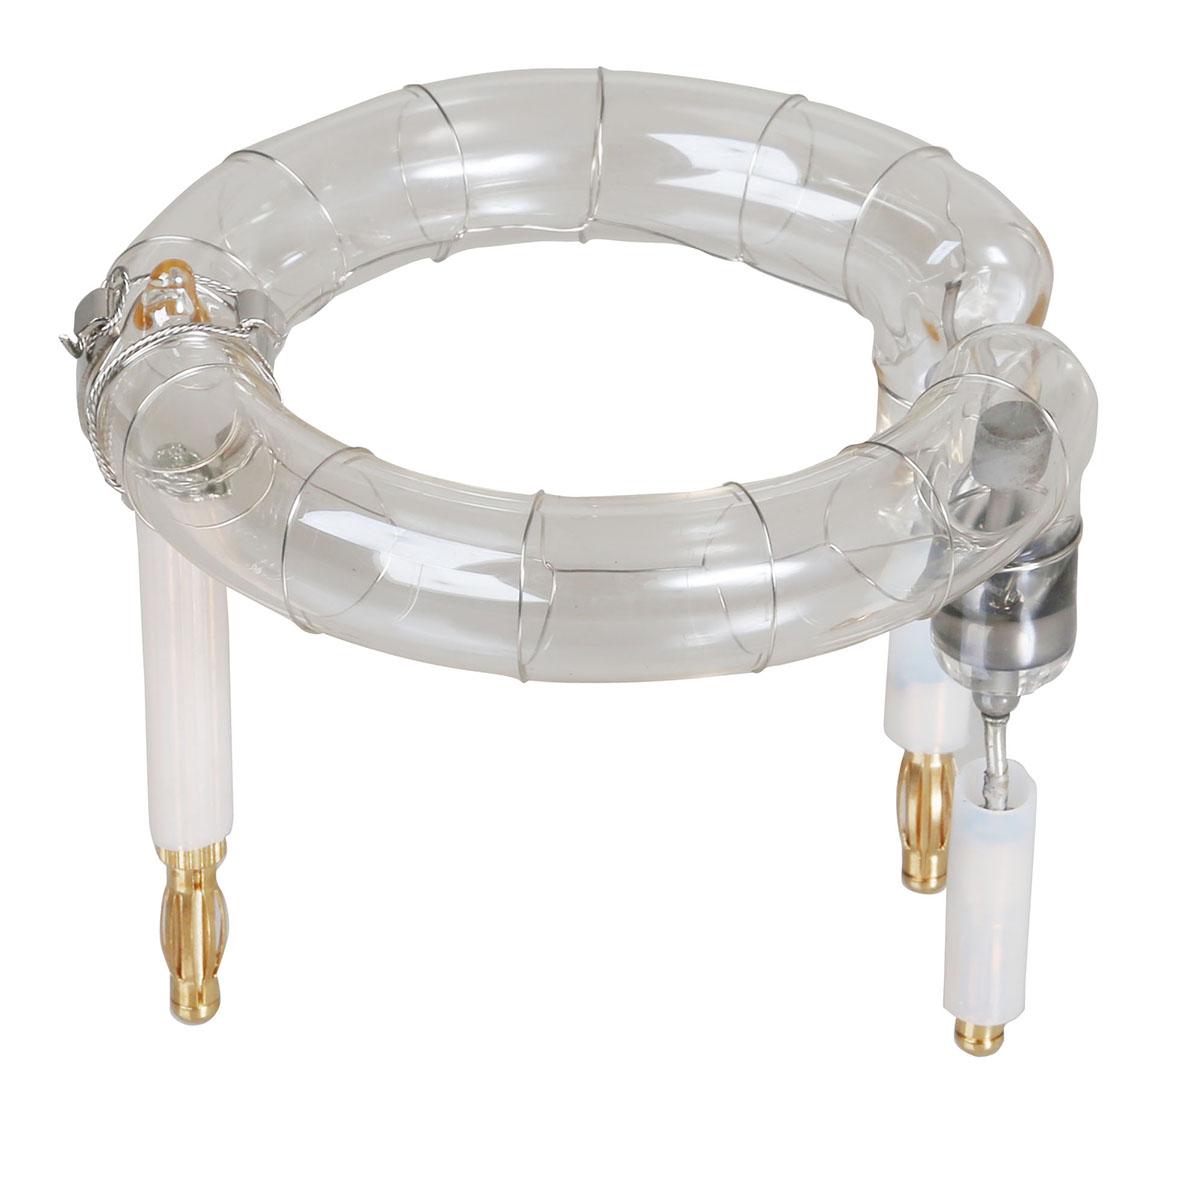 Phottix Indra500 TTL Replacement Flash Tube